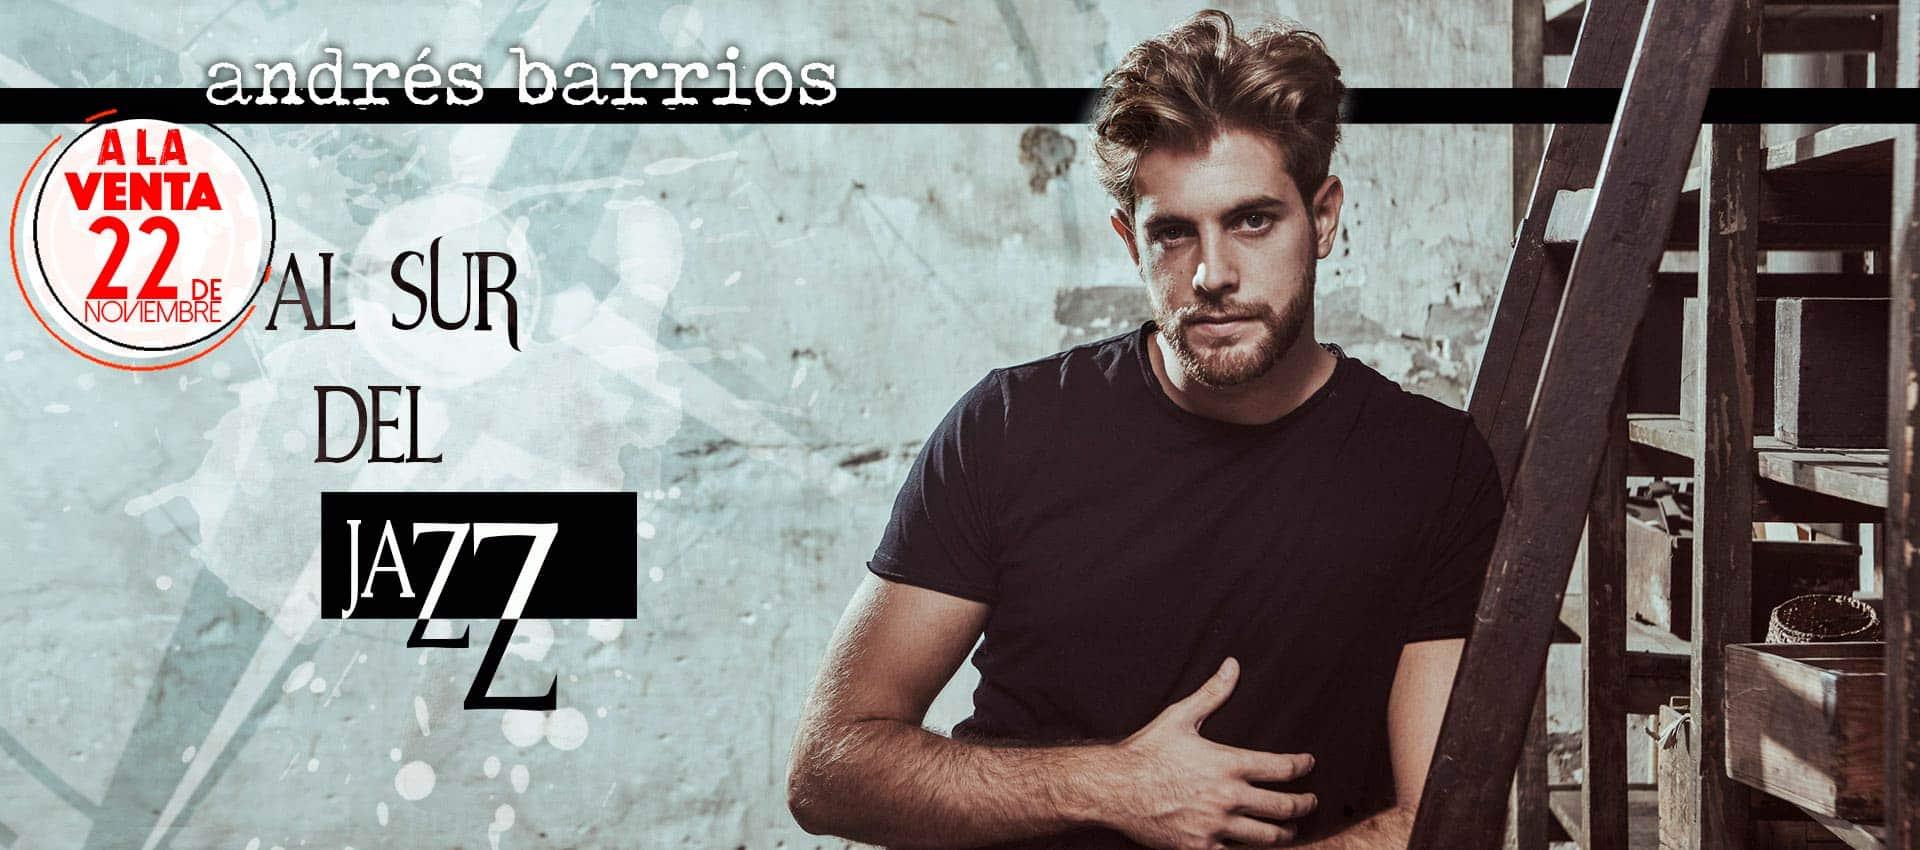 22 de noviembre sale el primer LP de Andrés Barrios